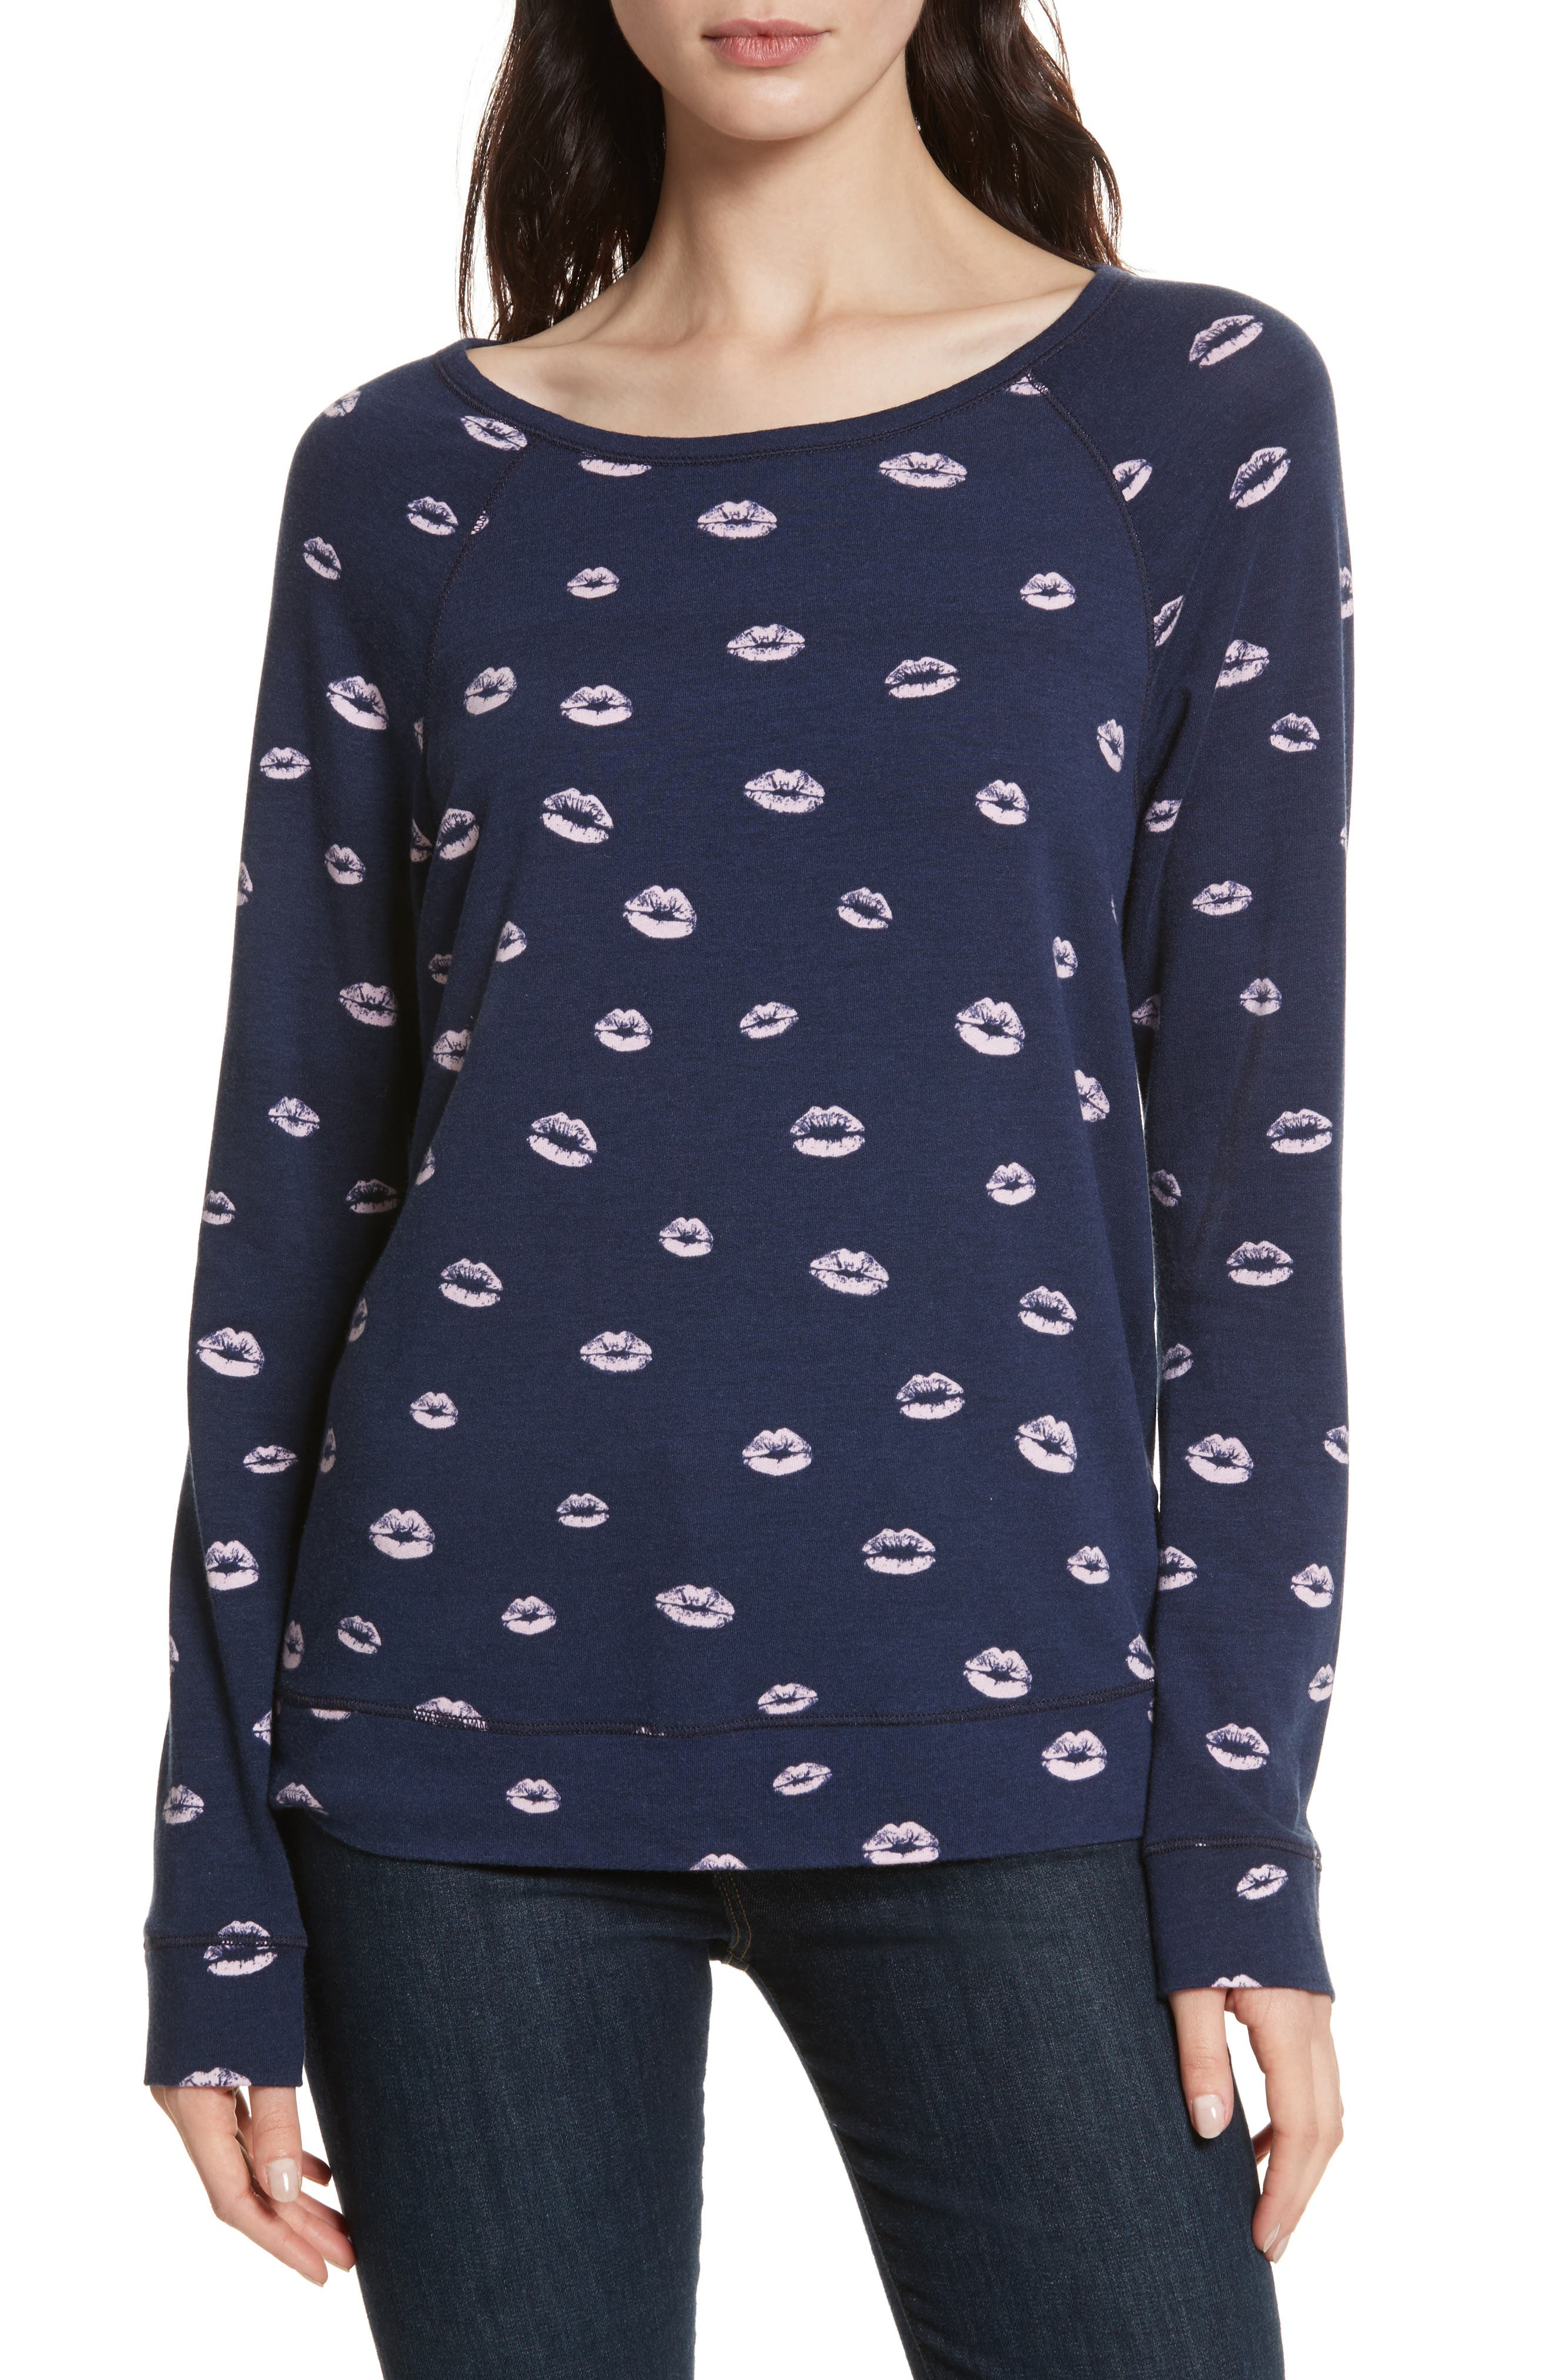 Alternate Image 1 Selected - Joie Annora B Kiss Print Sweatshirt